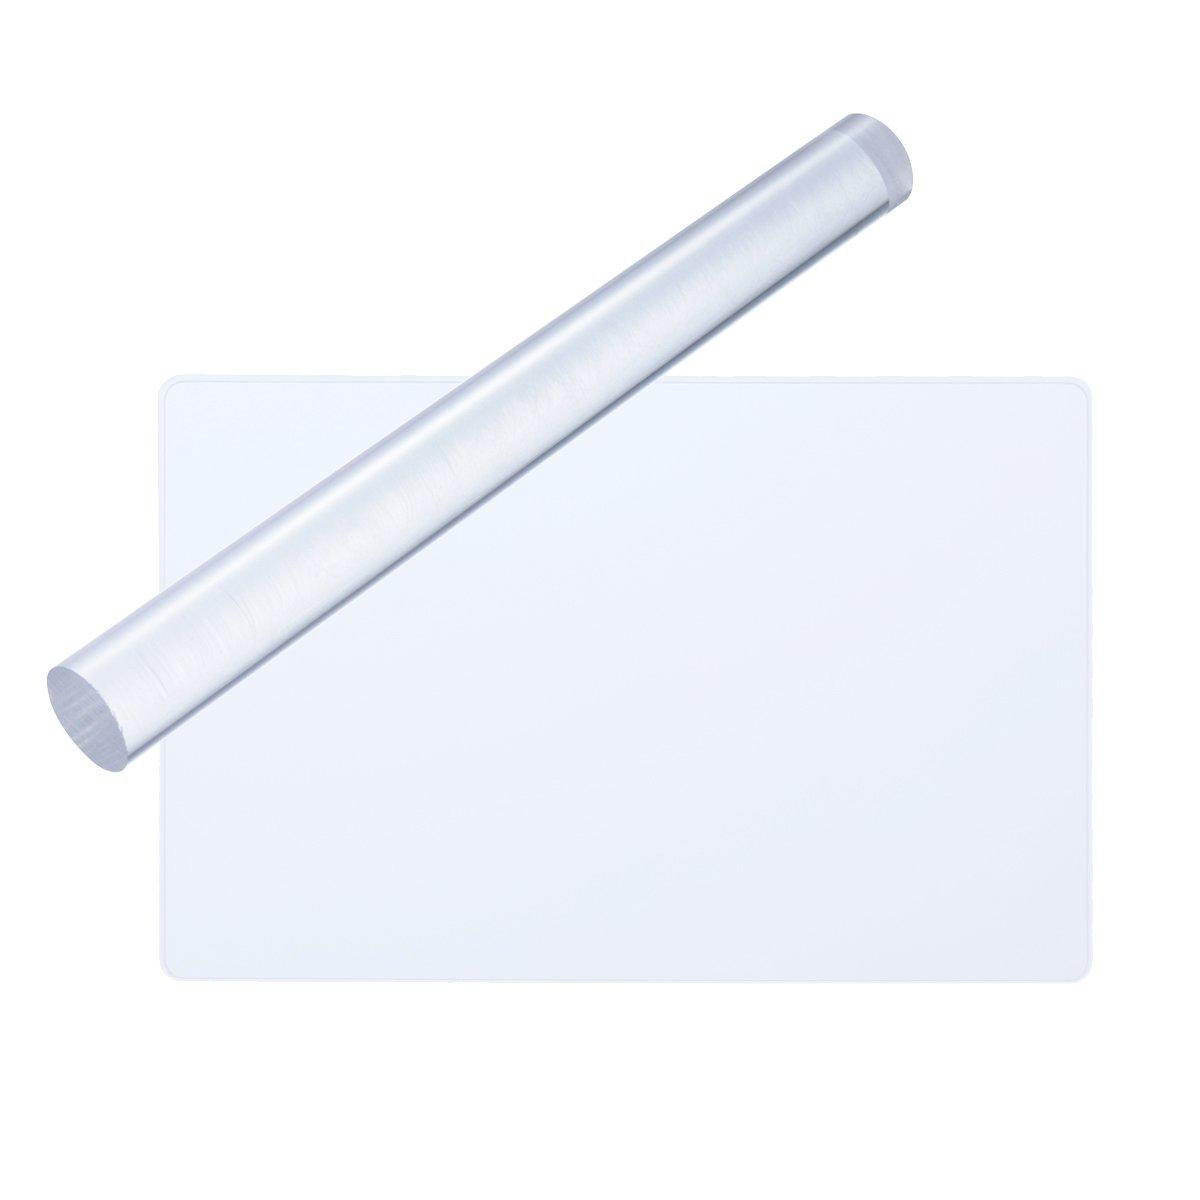 rosenice acrílico rodillo de arcilla rectangular acrílico hoja Junta con cuadrícula esencial 2pcs